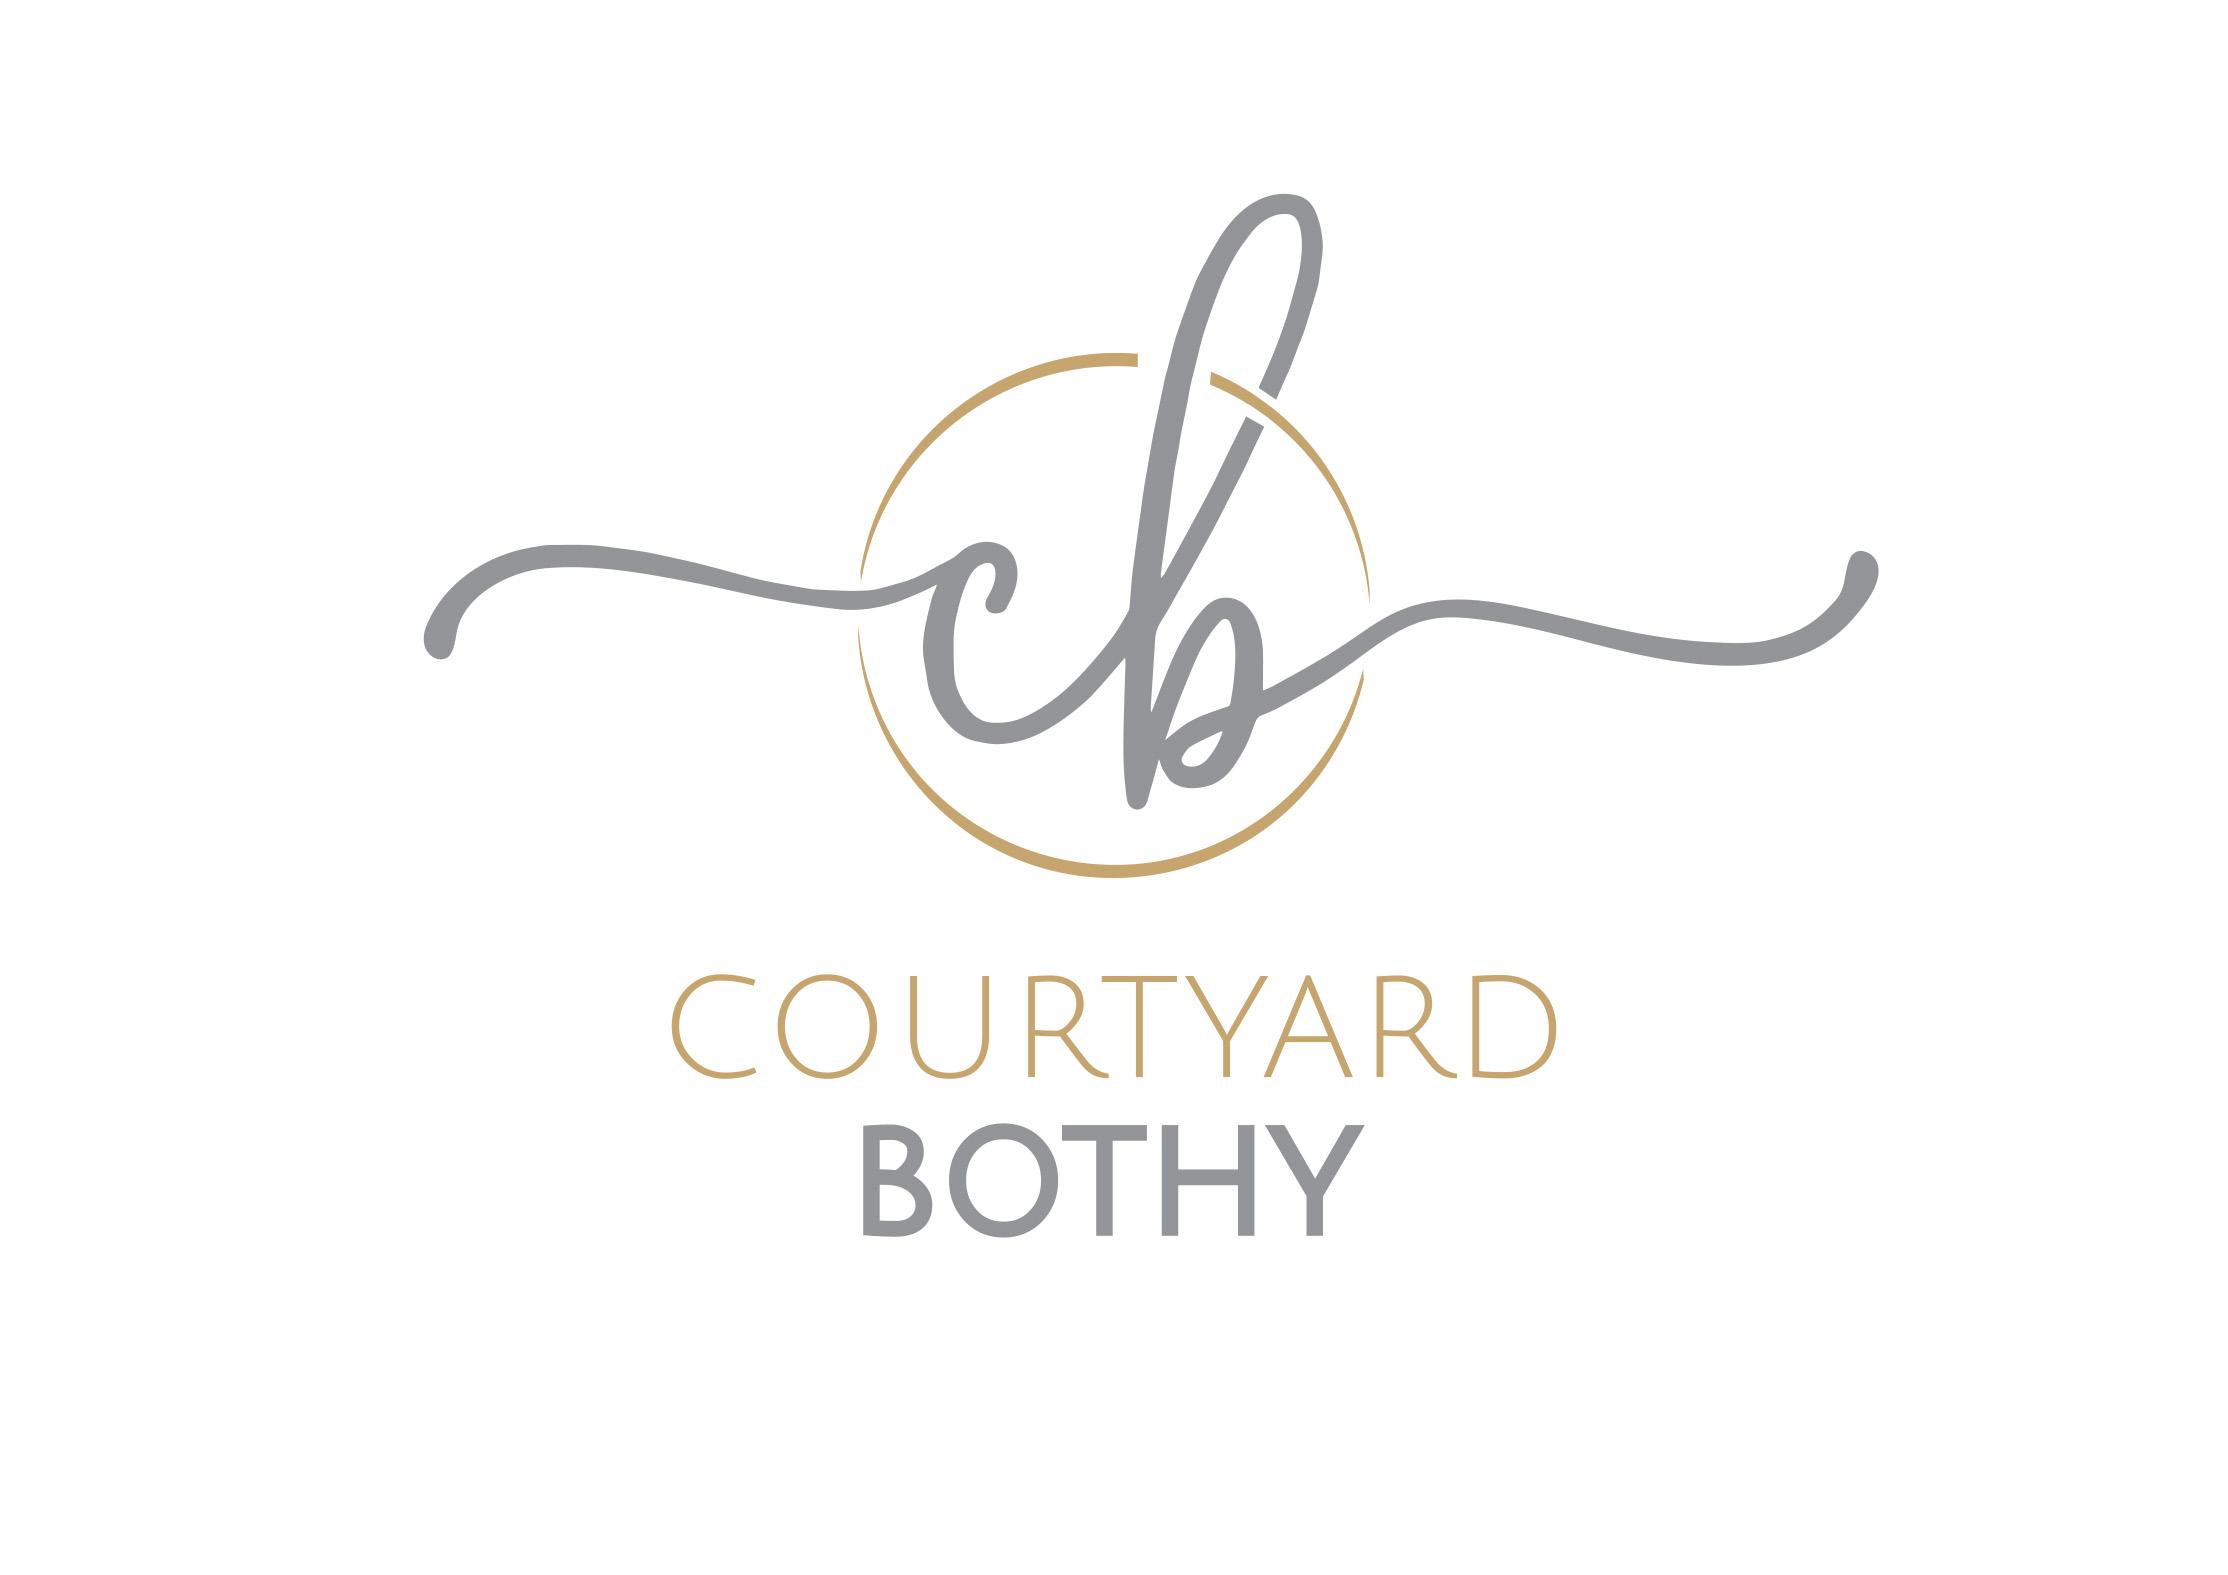 Courtyard Bothy logo